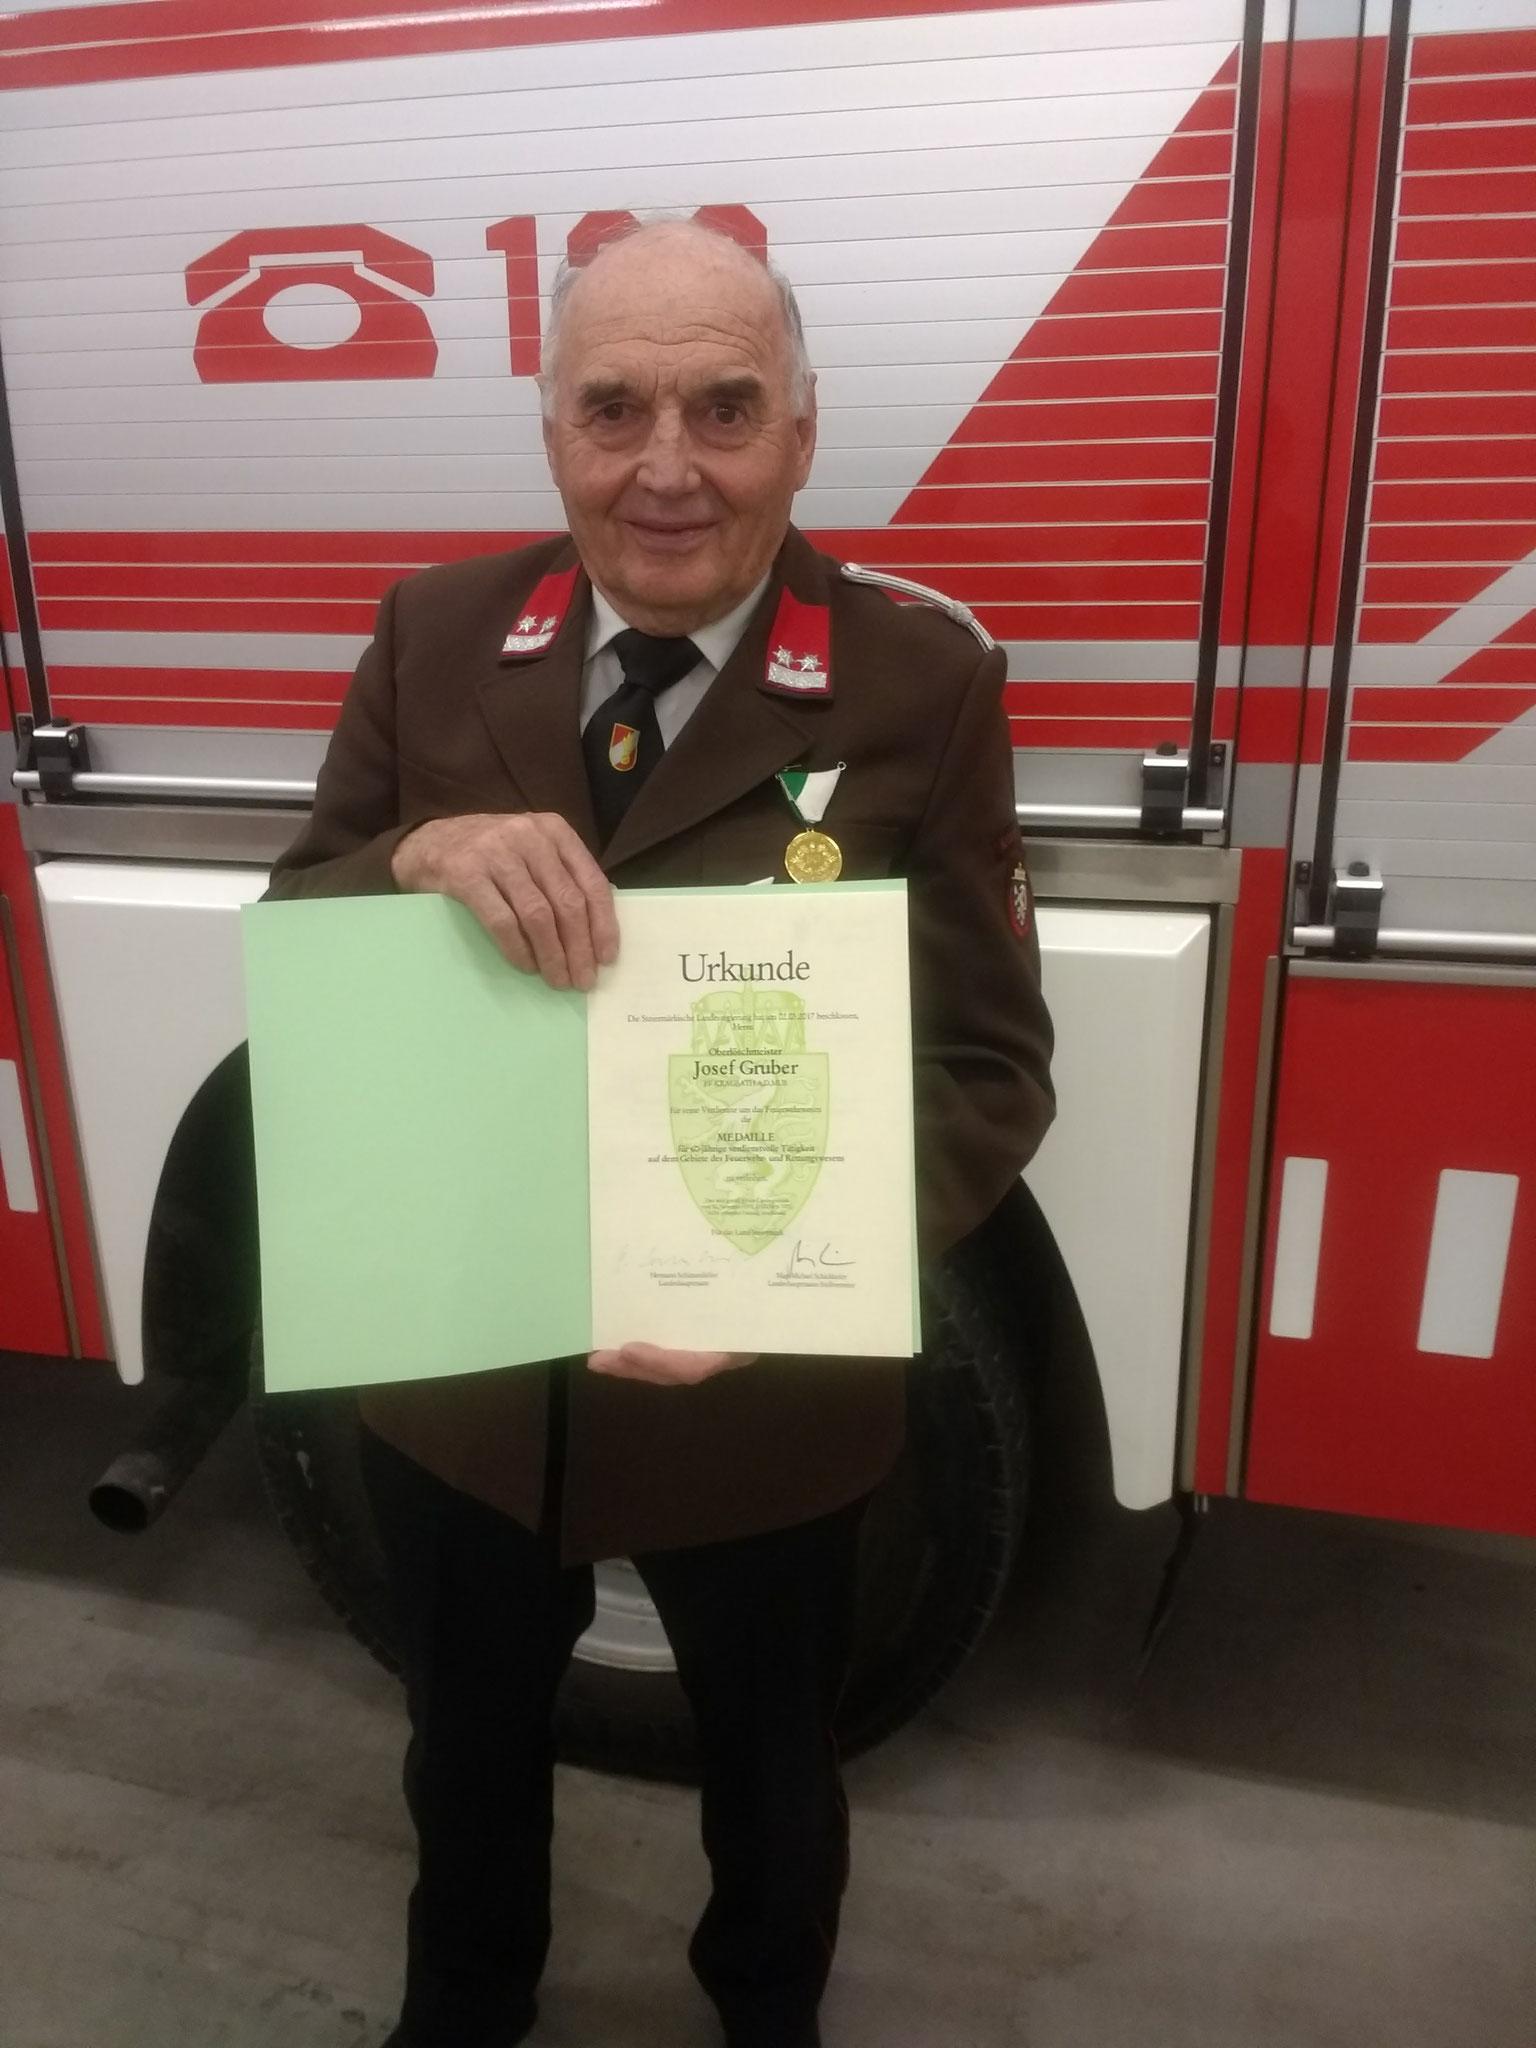 60 jährige Josef Gruber